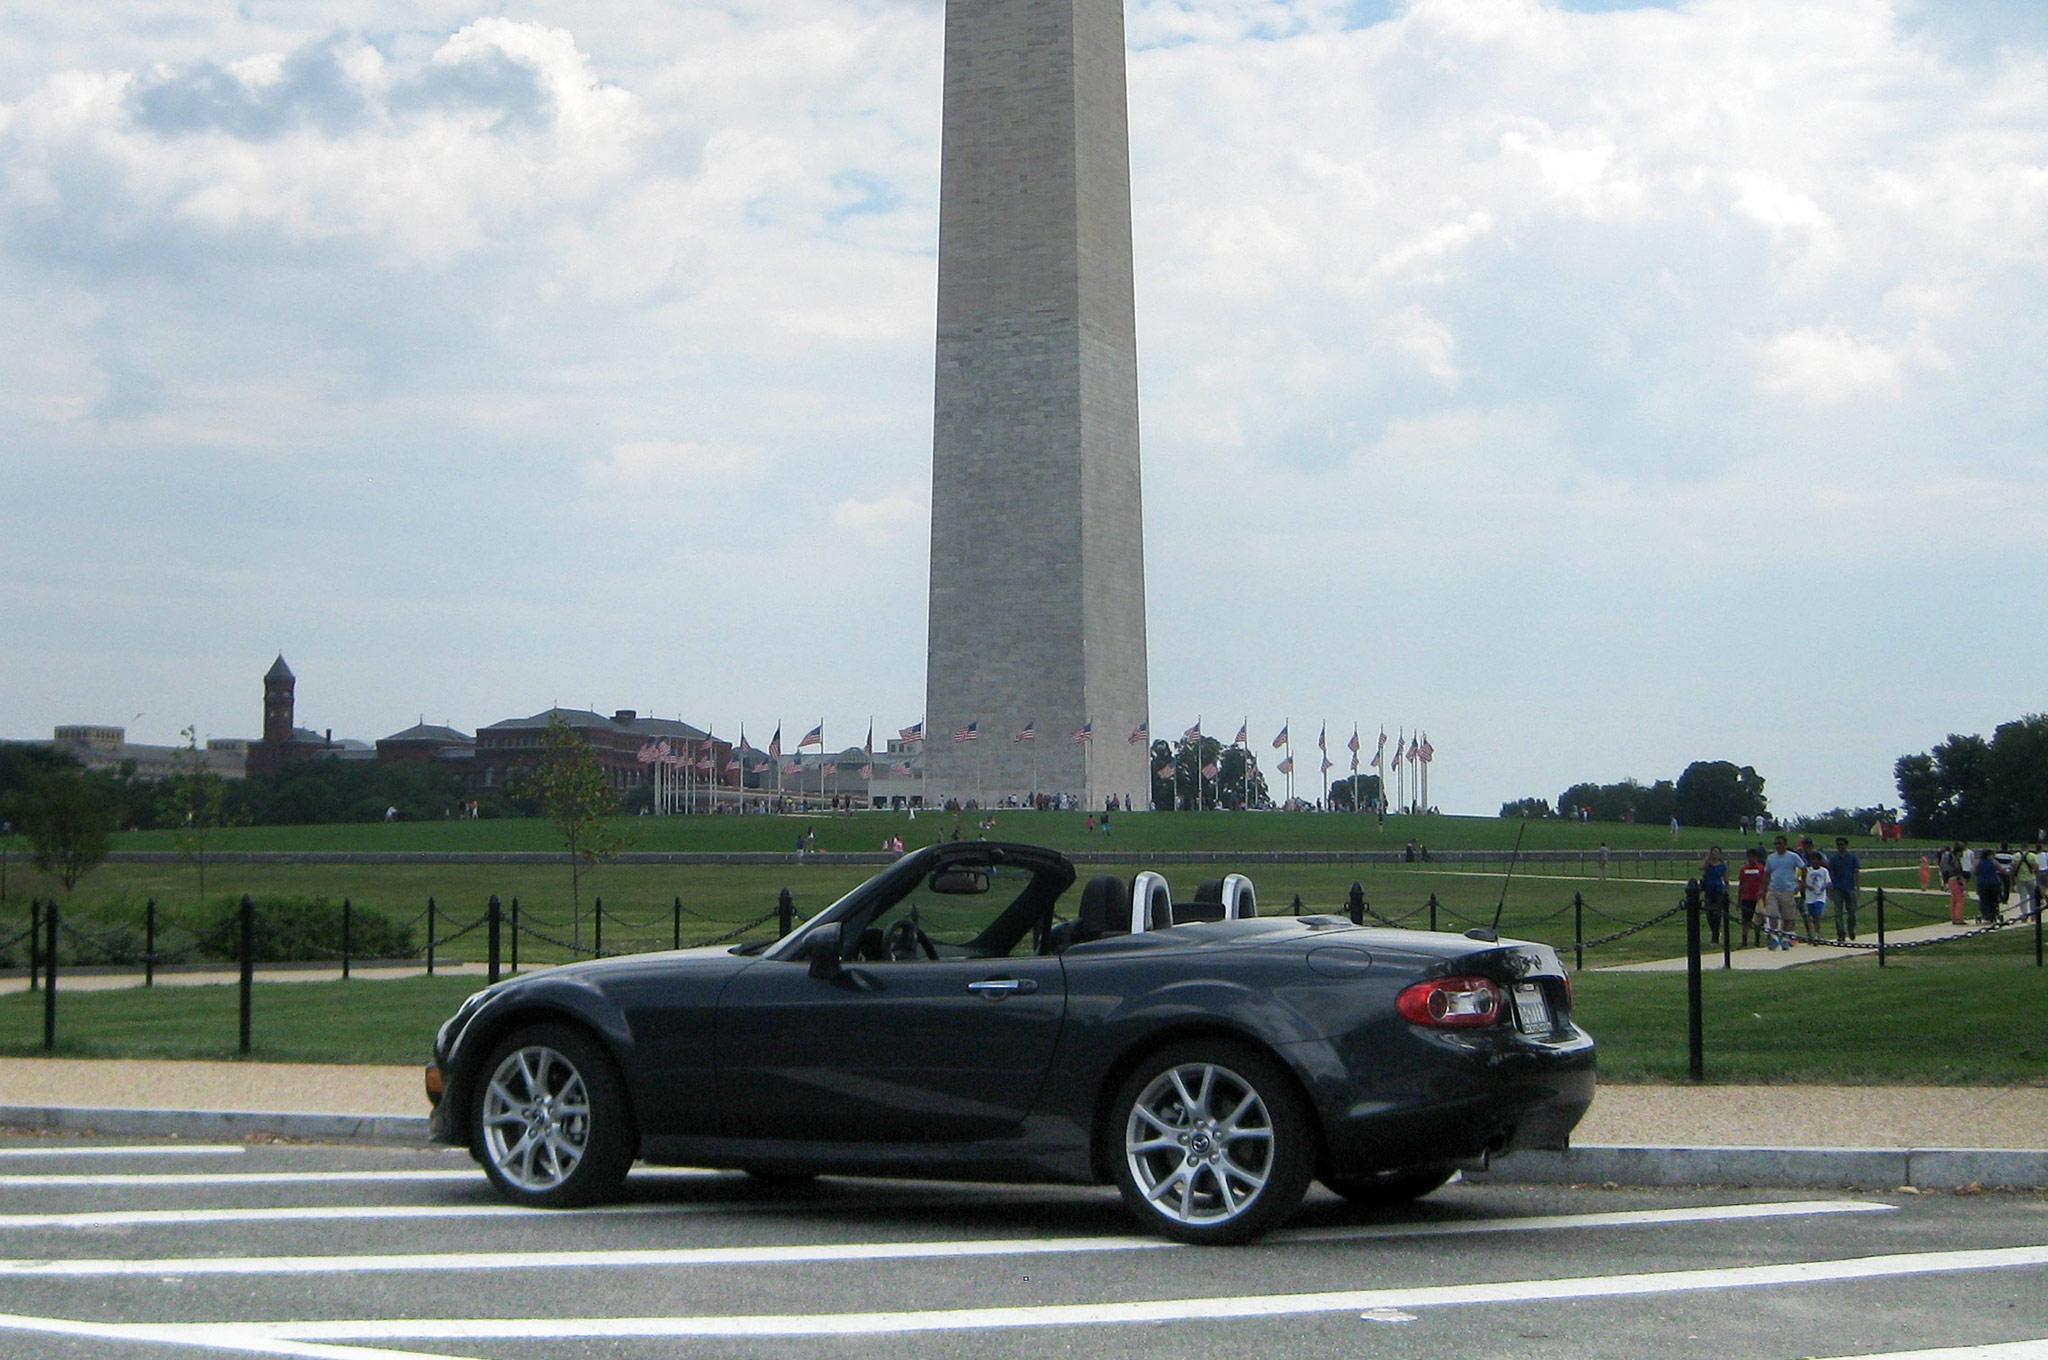 2014 Mazda Miata GT Profile By Washington Monument1